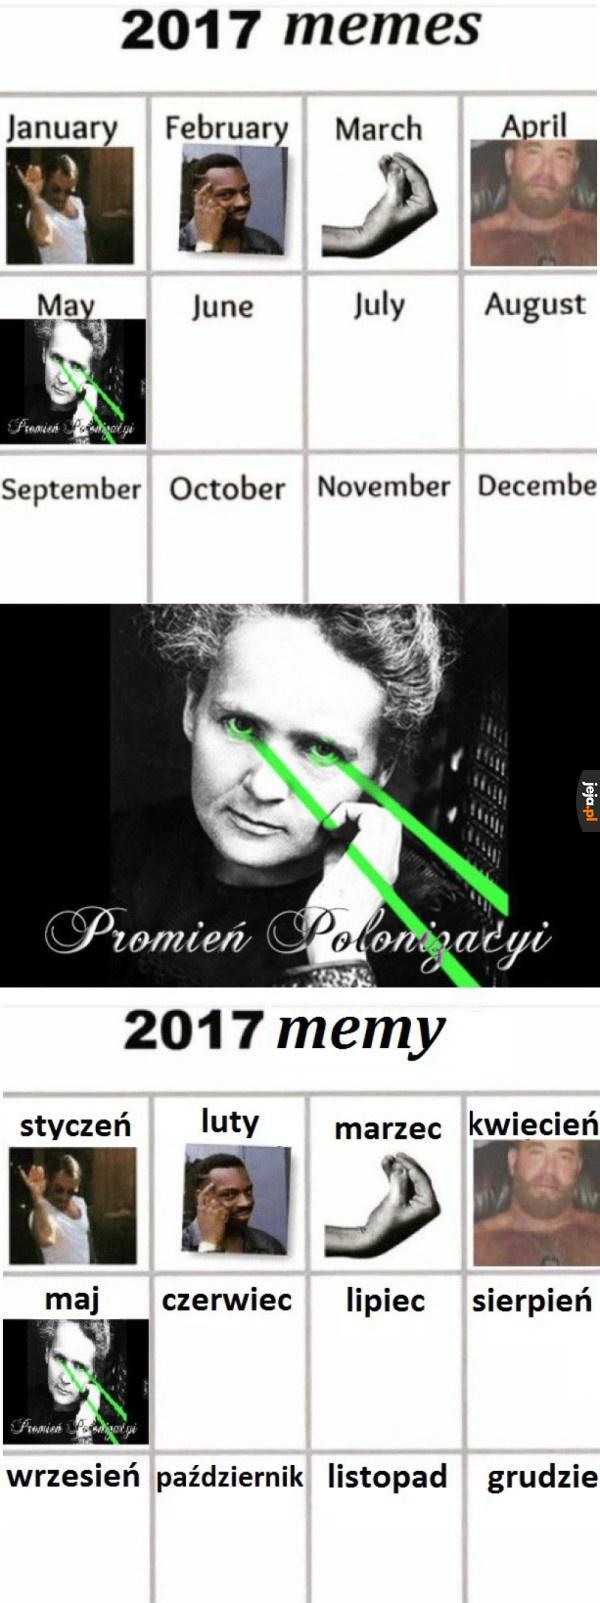 Polski promień, polski mem!